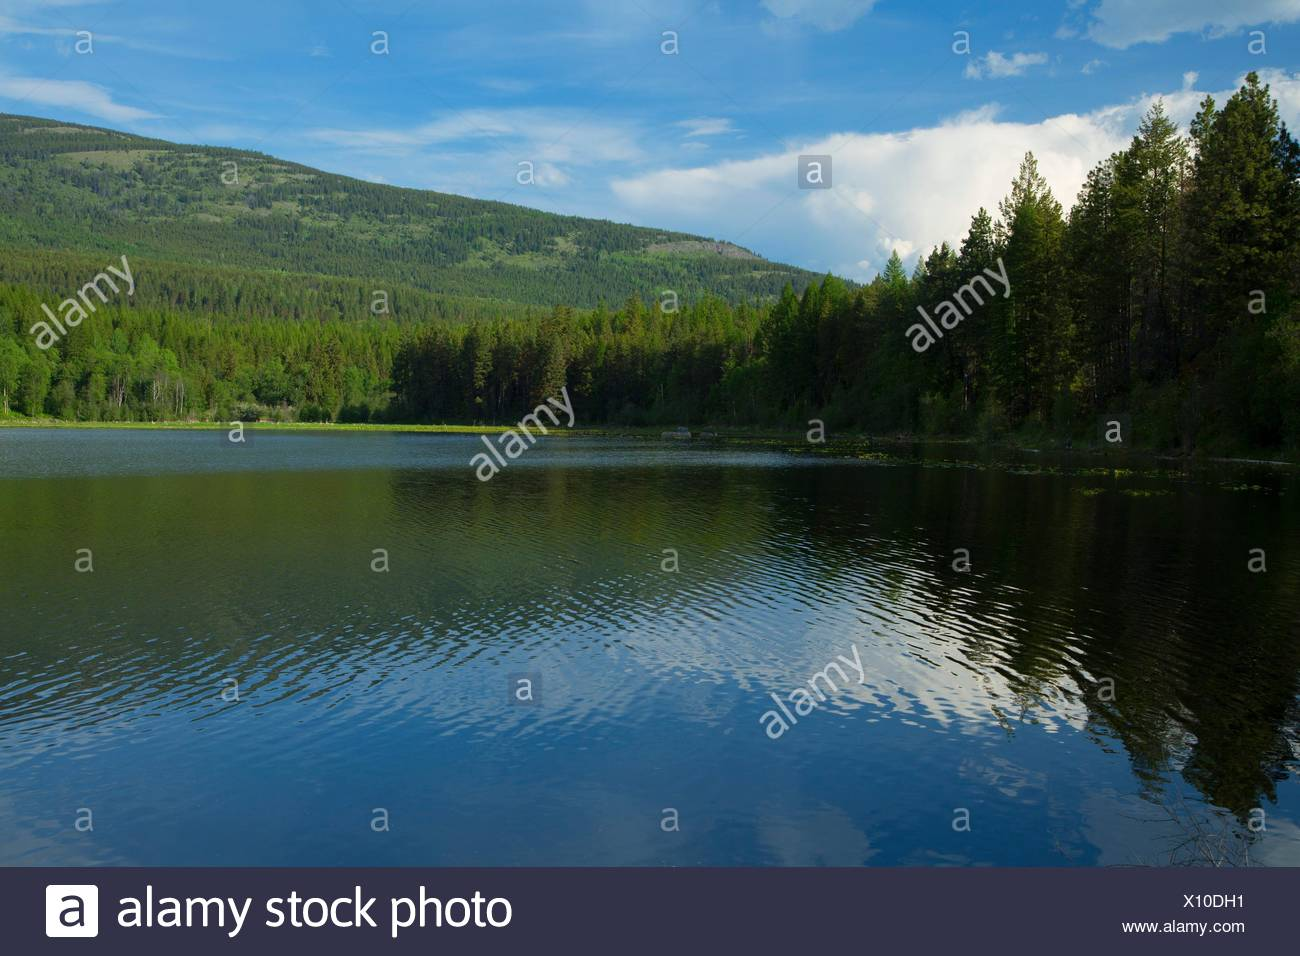 Bürste See, kaniksu National Forest, Idaho. Stockbild